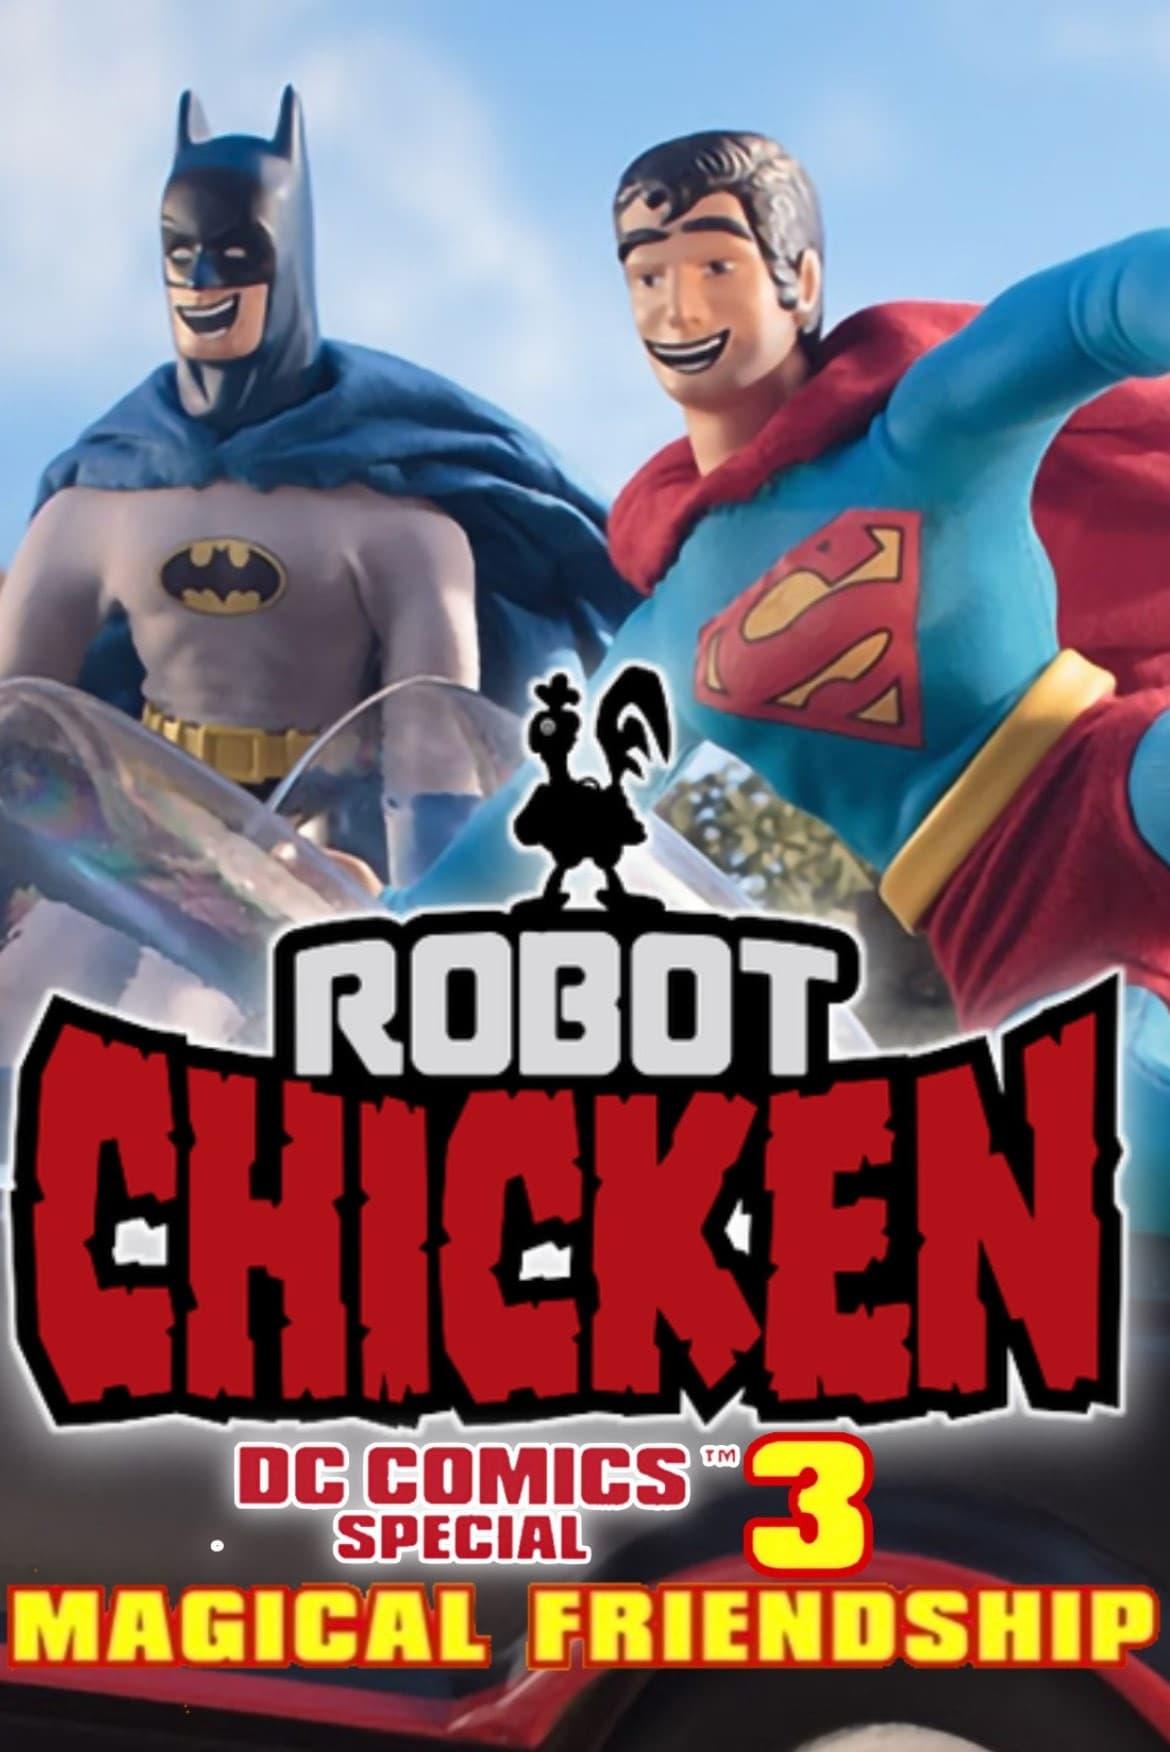 Robot Chicken: Especial DC Comics III - Amistad Mágica